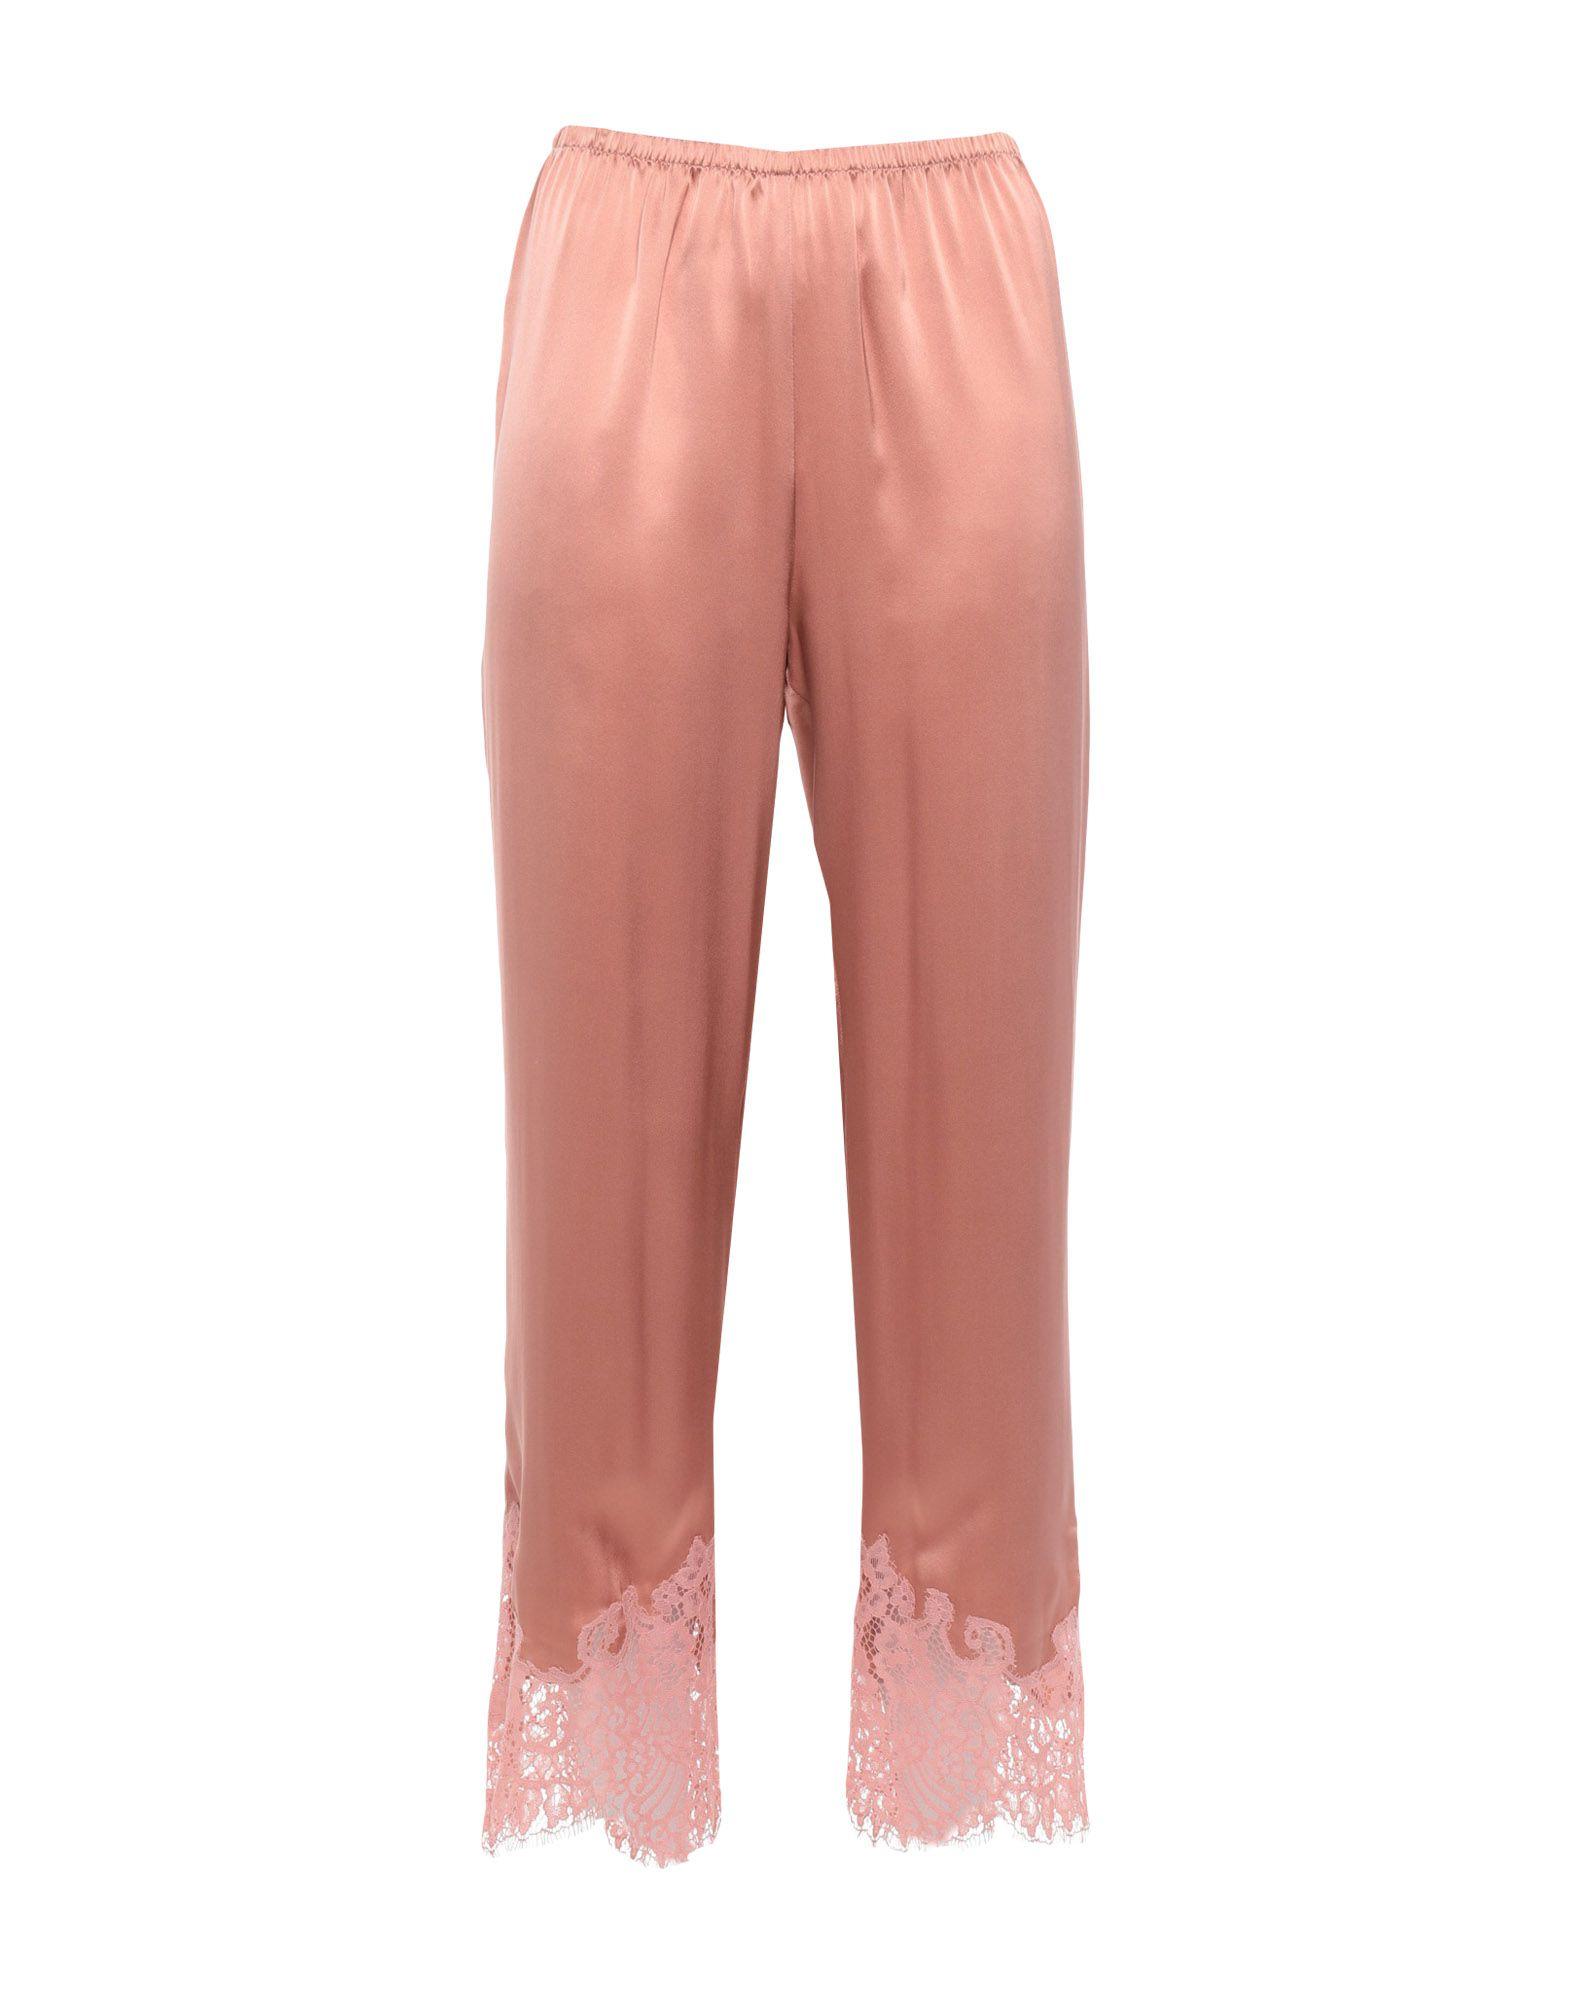 7224dd6bb58f Ermanno Scervino Lingerie Sleepwear In Pink